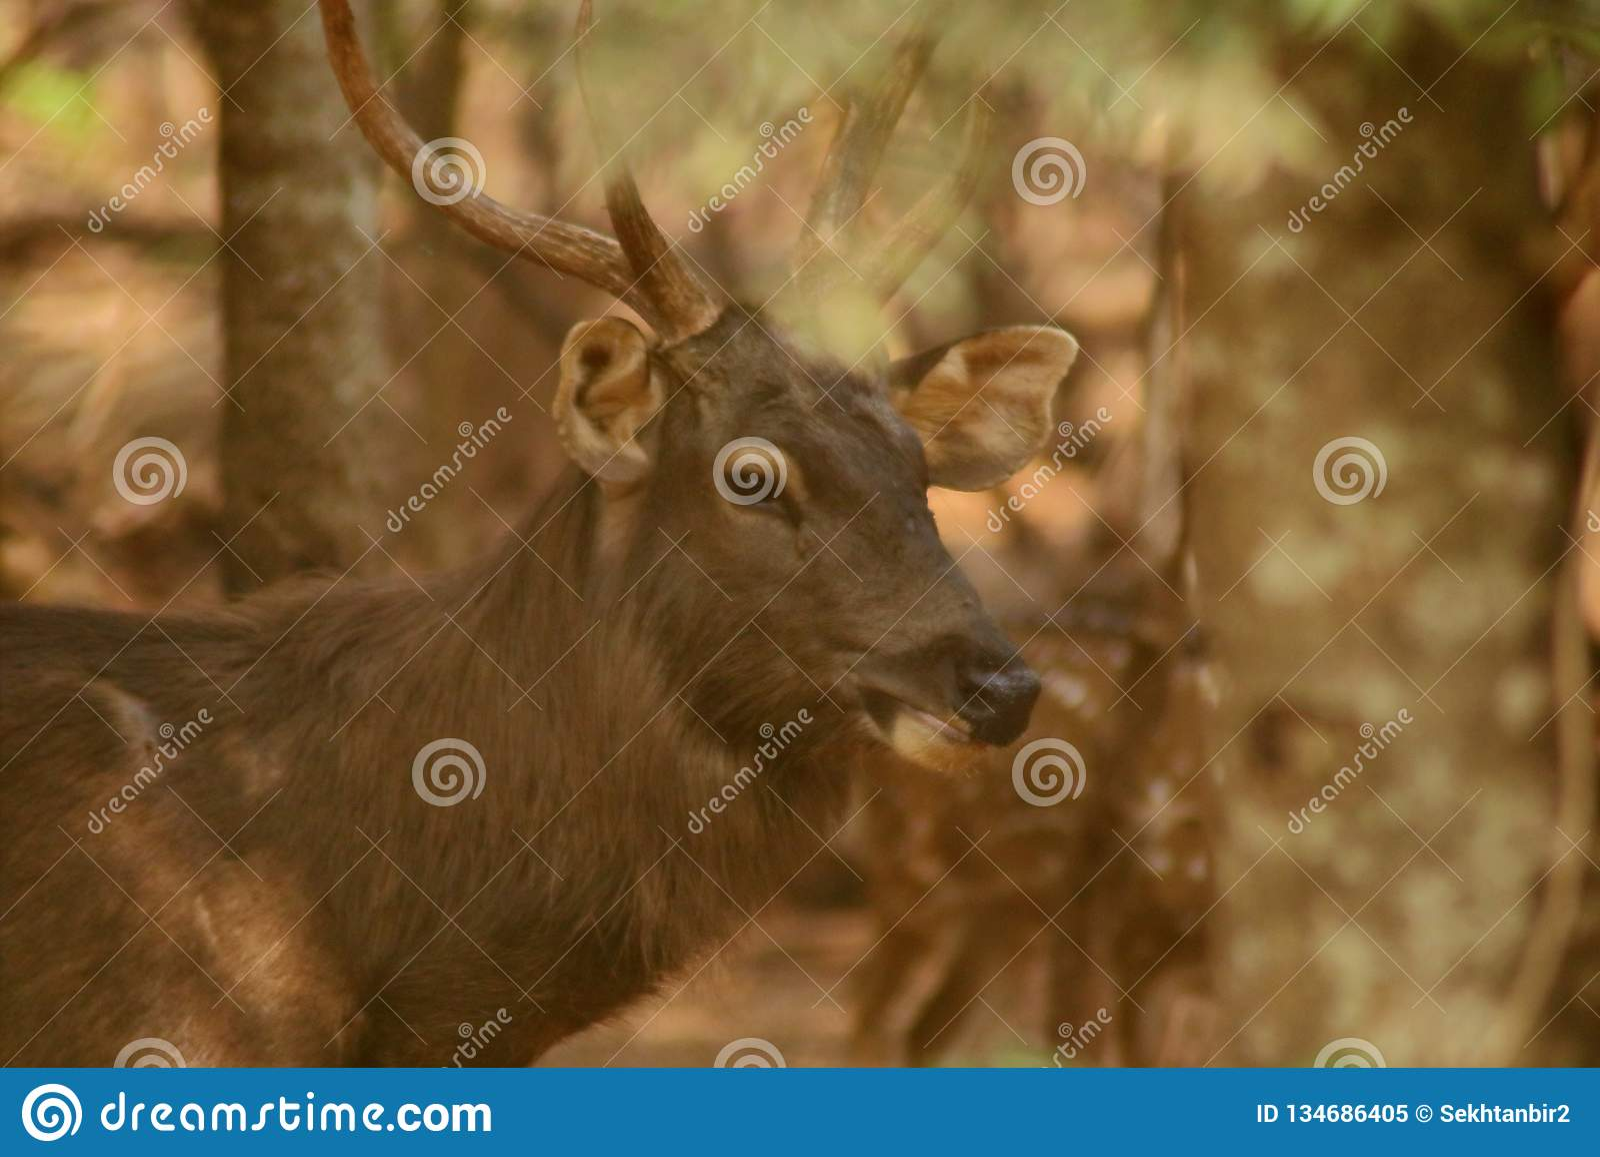 The Deer Have Big Horn